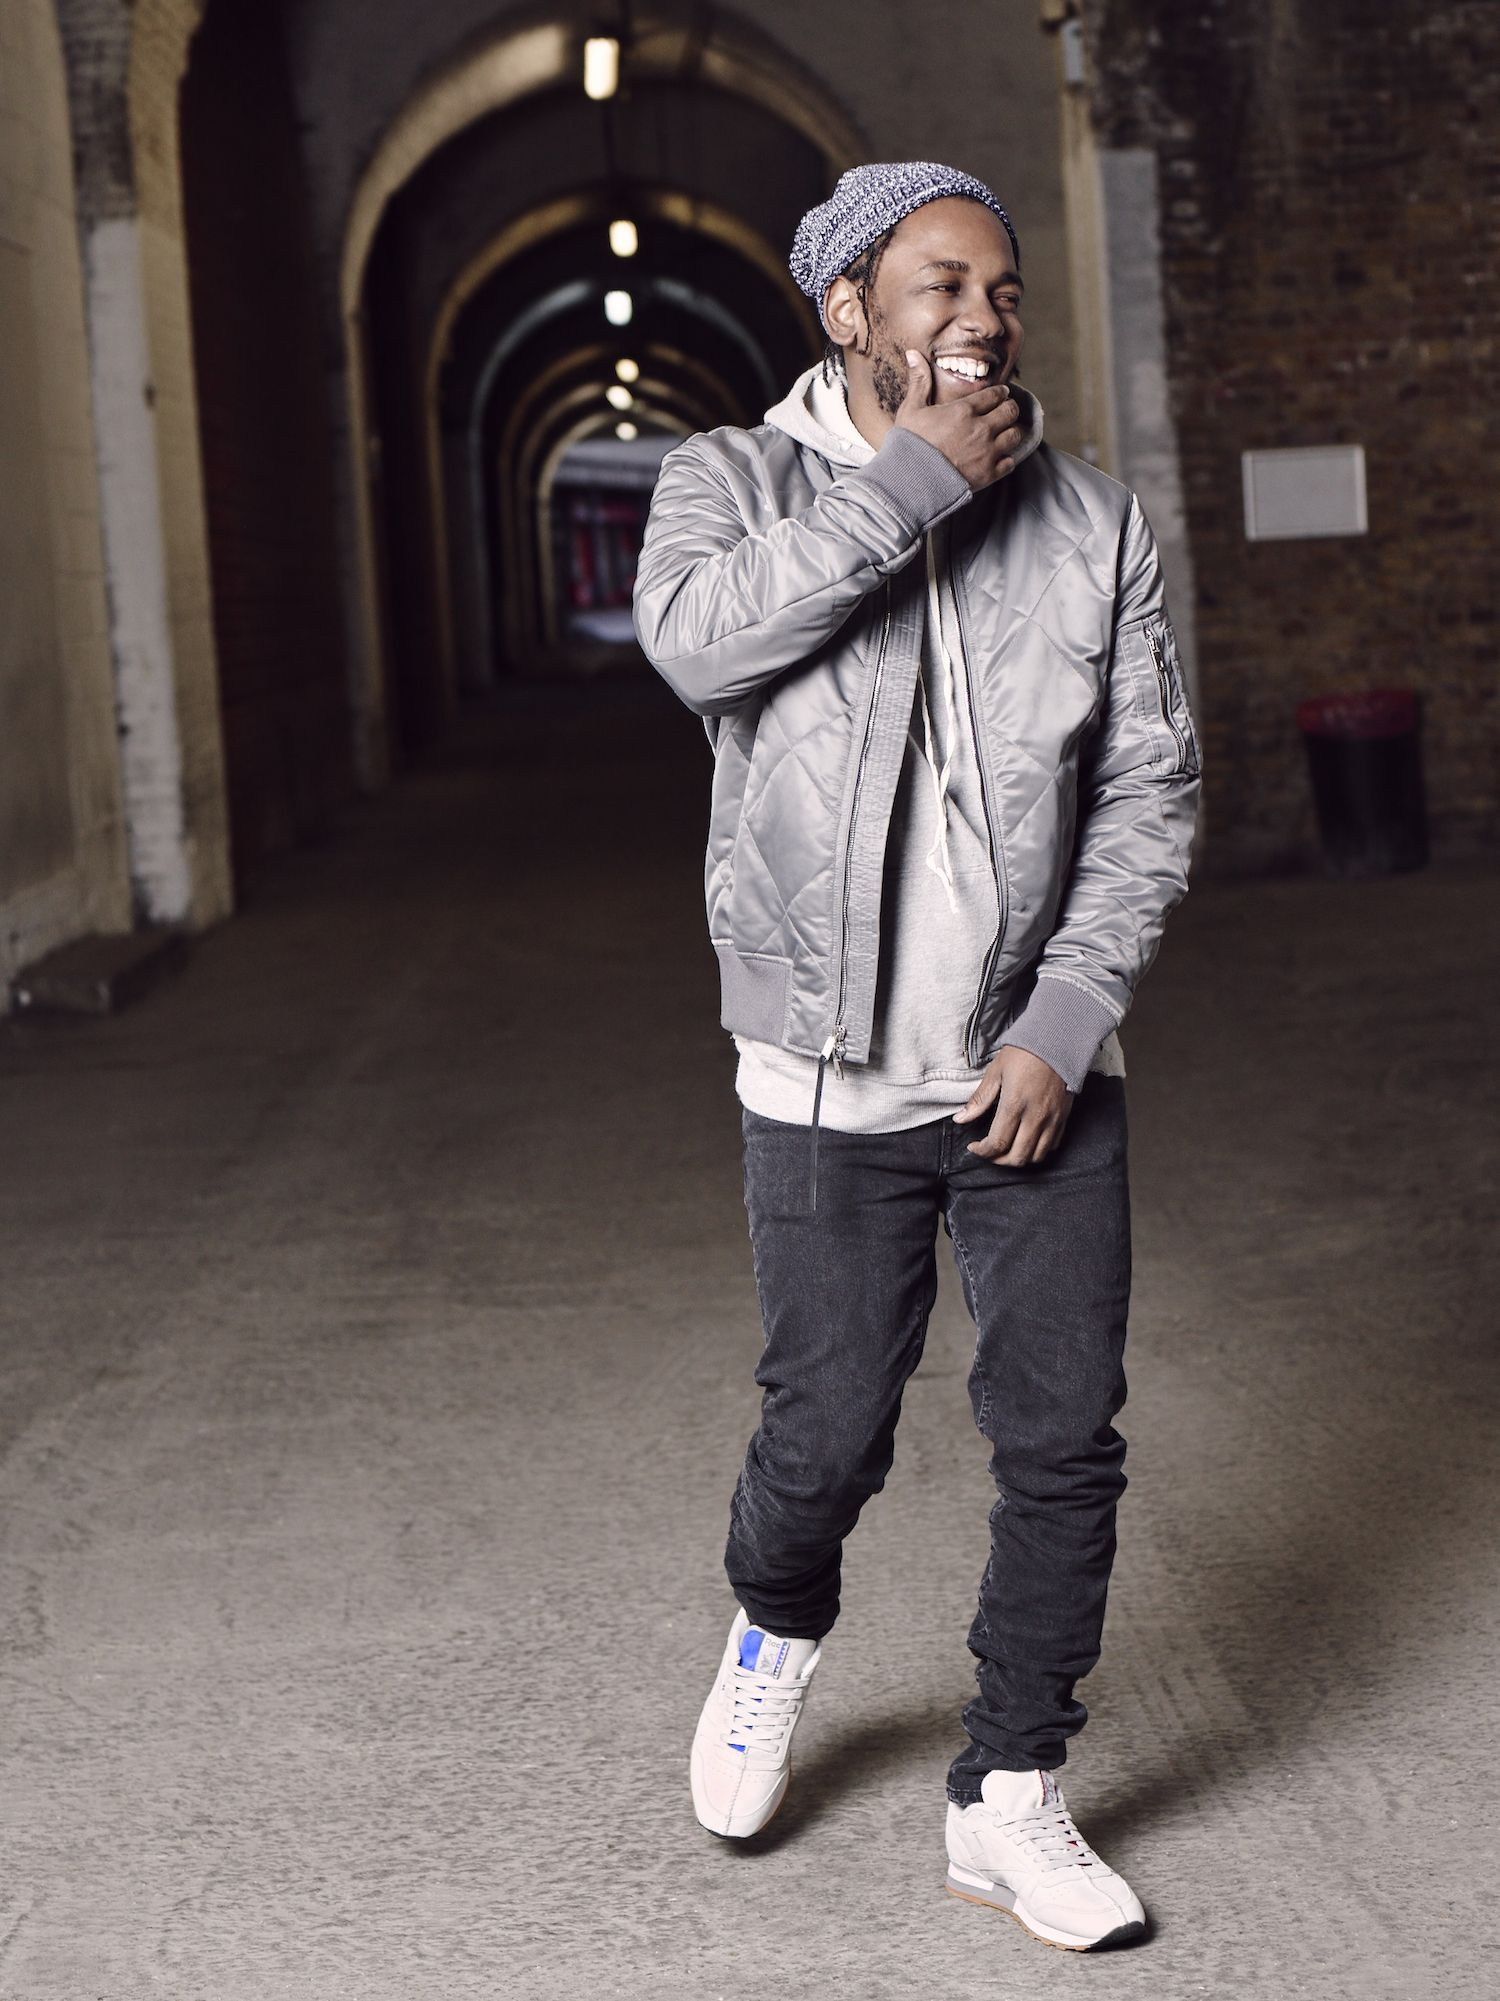 Islas Faroe queso Confuso  Releasing: Kendrick Lamar x Reebok Classic Leather Deconstructed - EU  Kicks: Sneaker Magazine | Kendrick lamar, Reebok classic, Kendrick